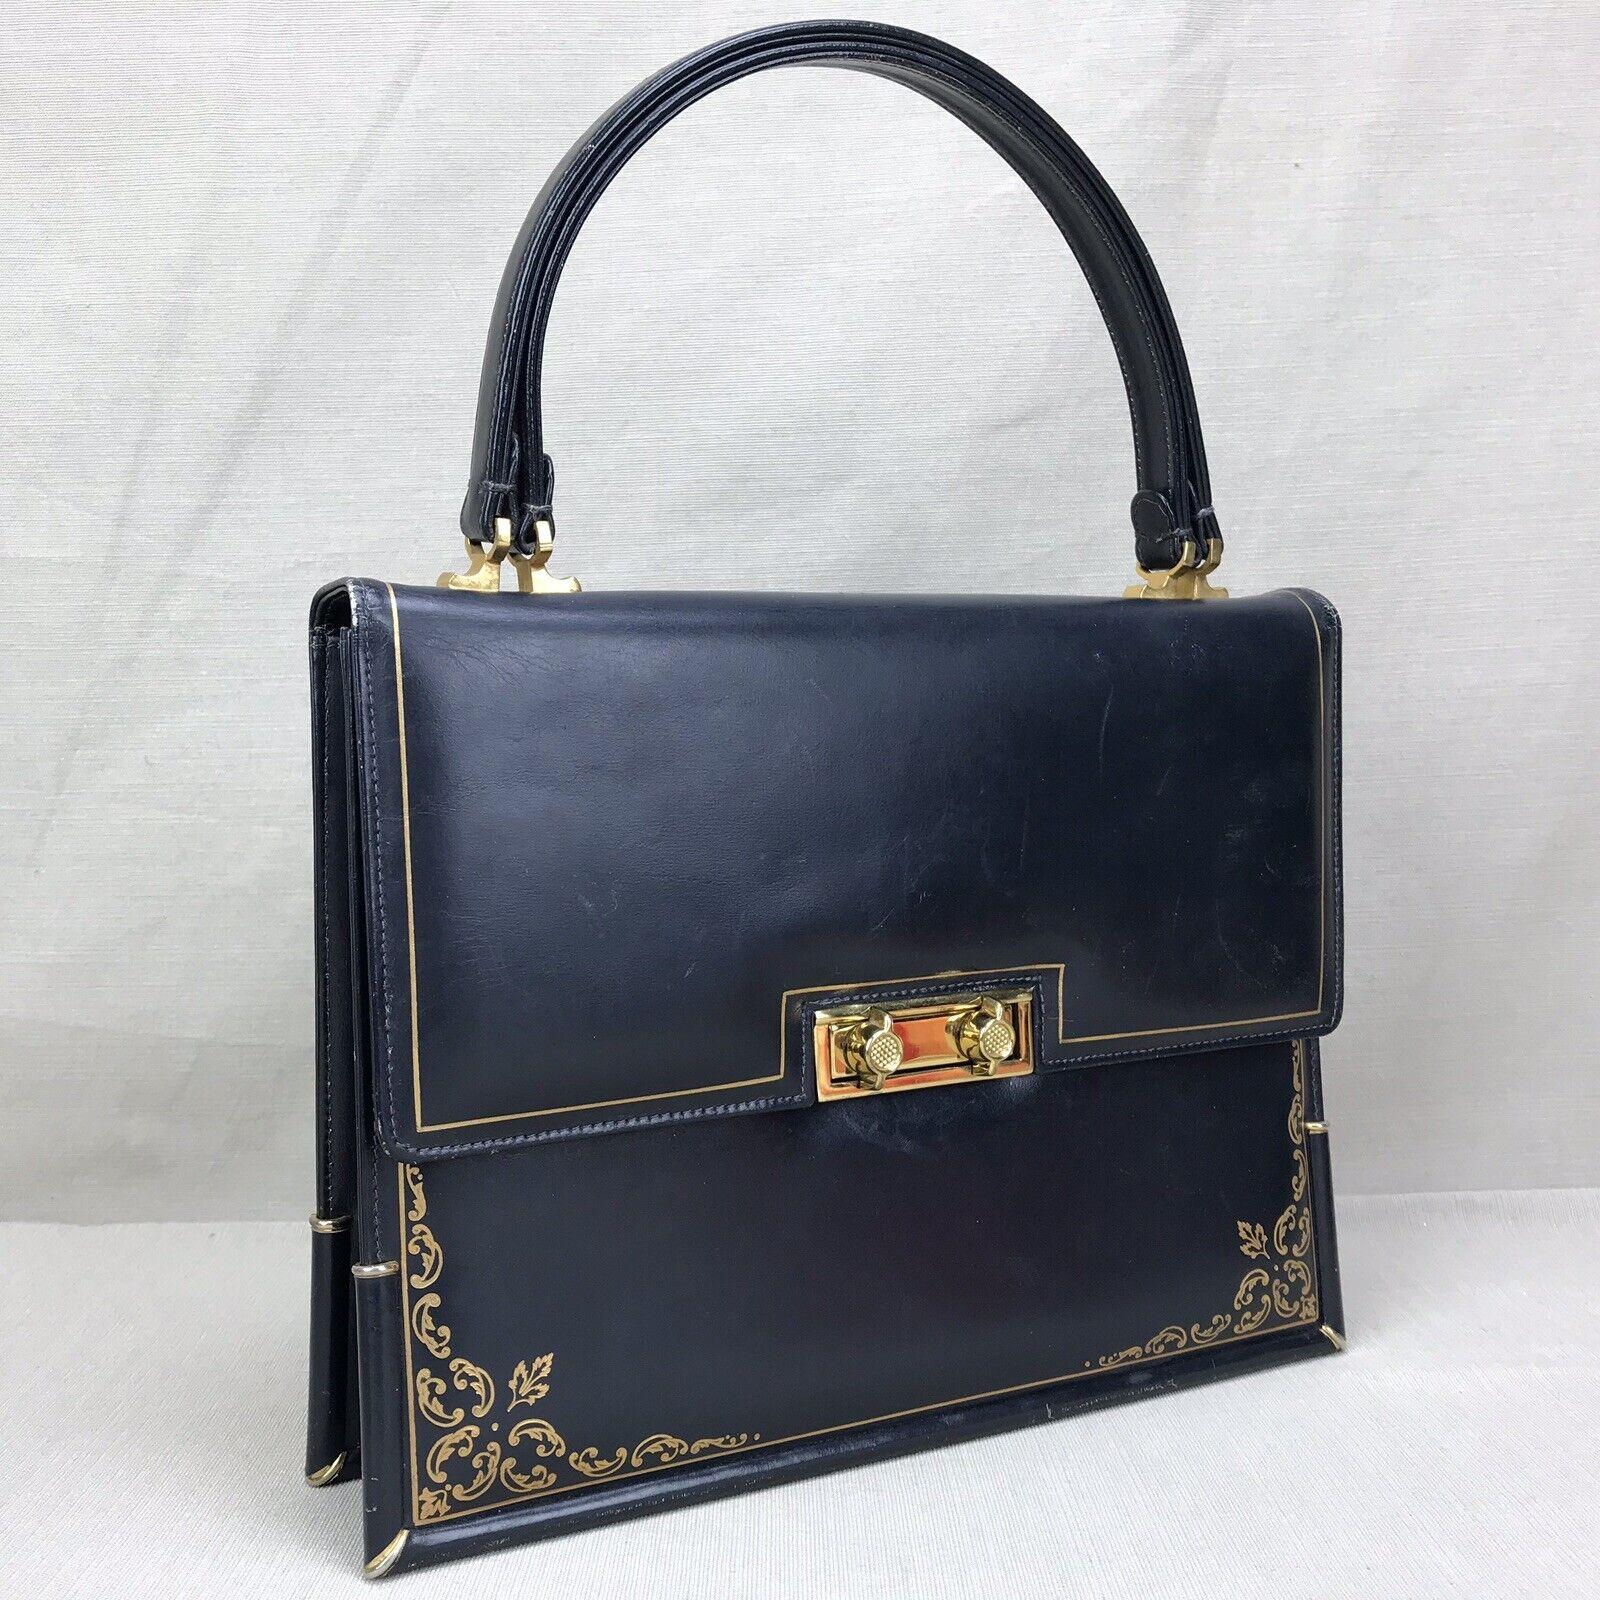 Scuola del Cuoio Vintage 1950s Purse Blue Gold Em… - image 12